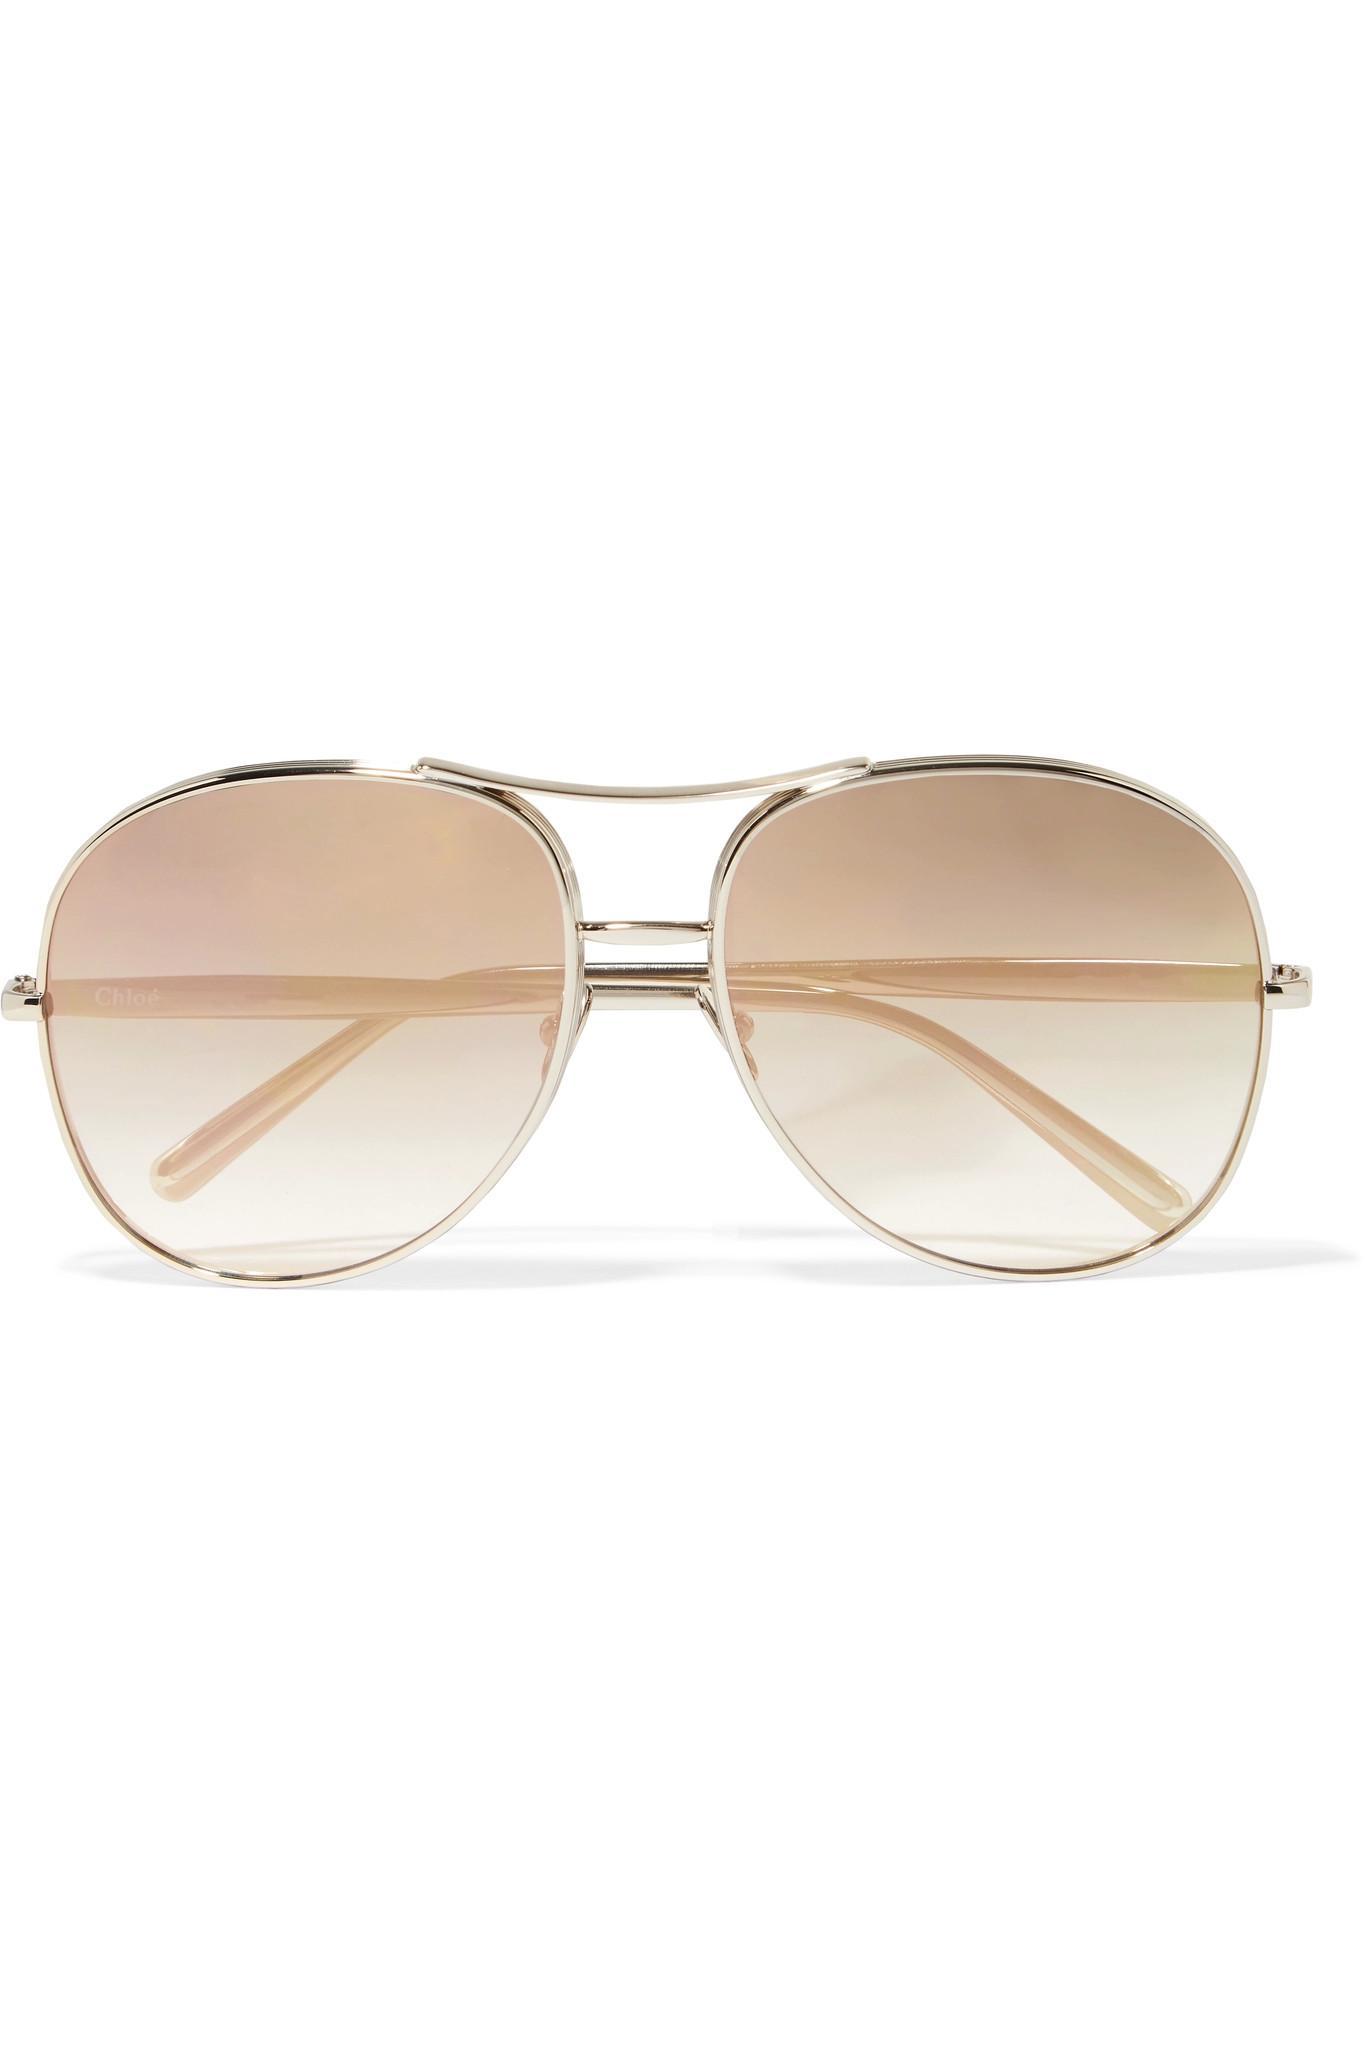 Chloe Gold Frame Sunglasses : Chloe Nola Aviator-style Gold-tone Mirrored Sunglasses in ...